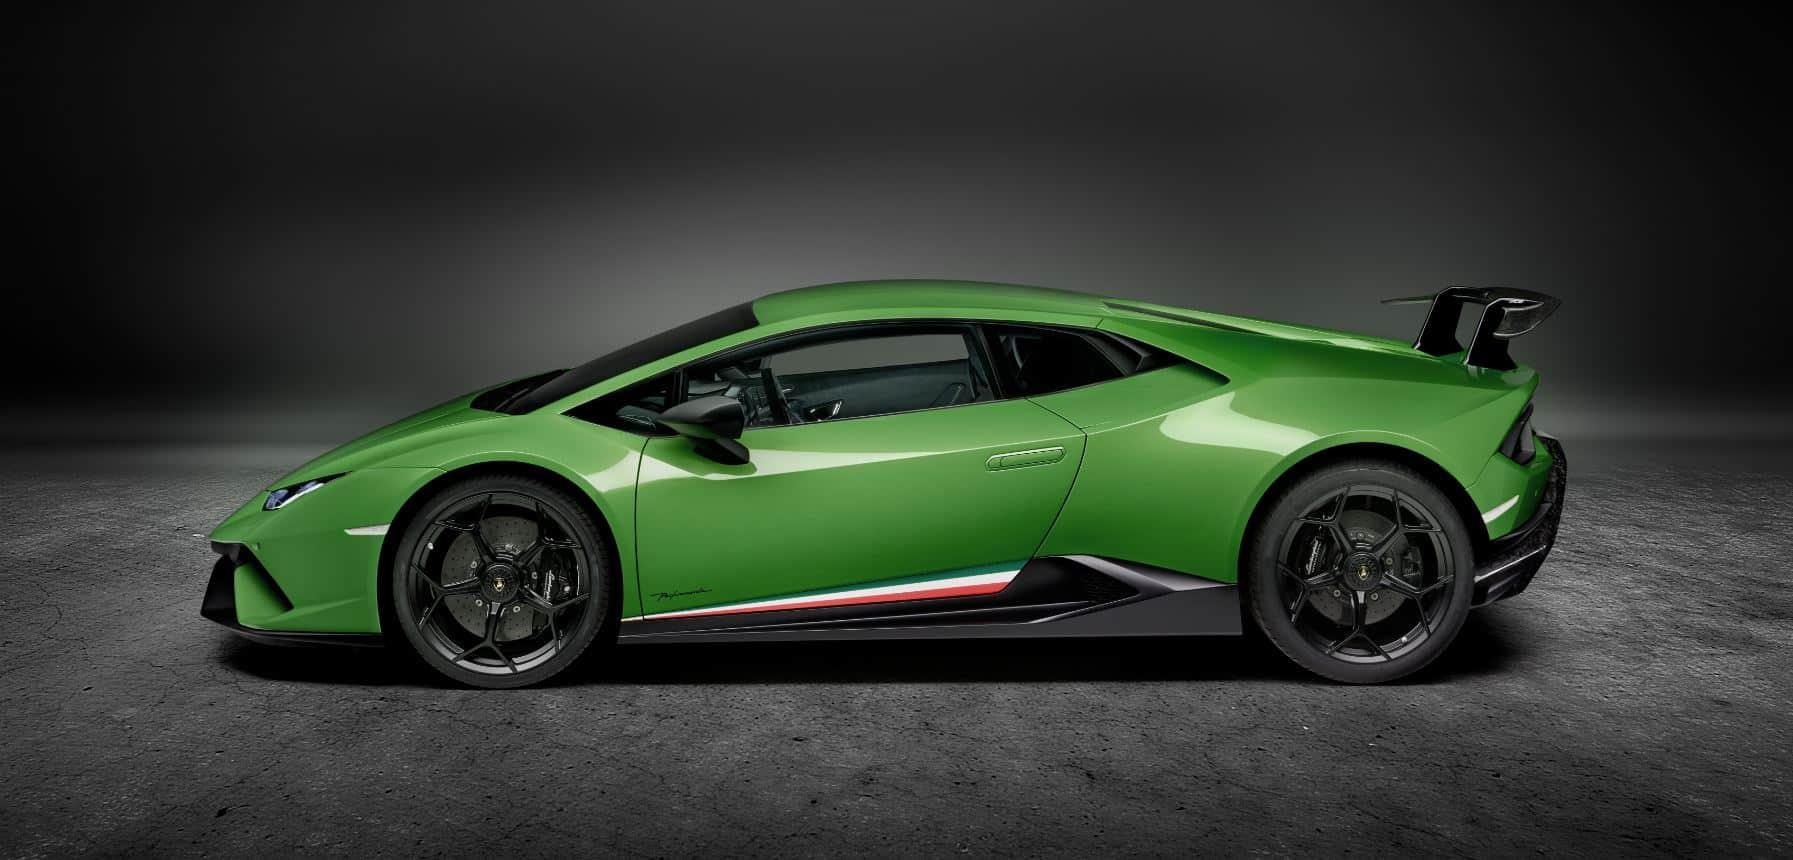 Lamborghini Huracán Performante 14